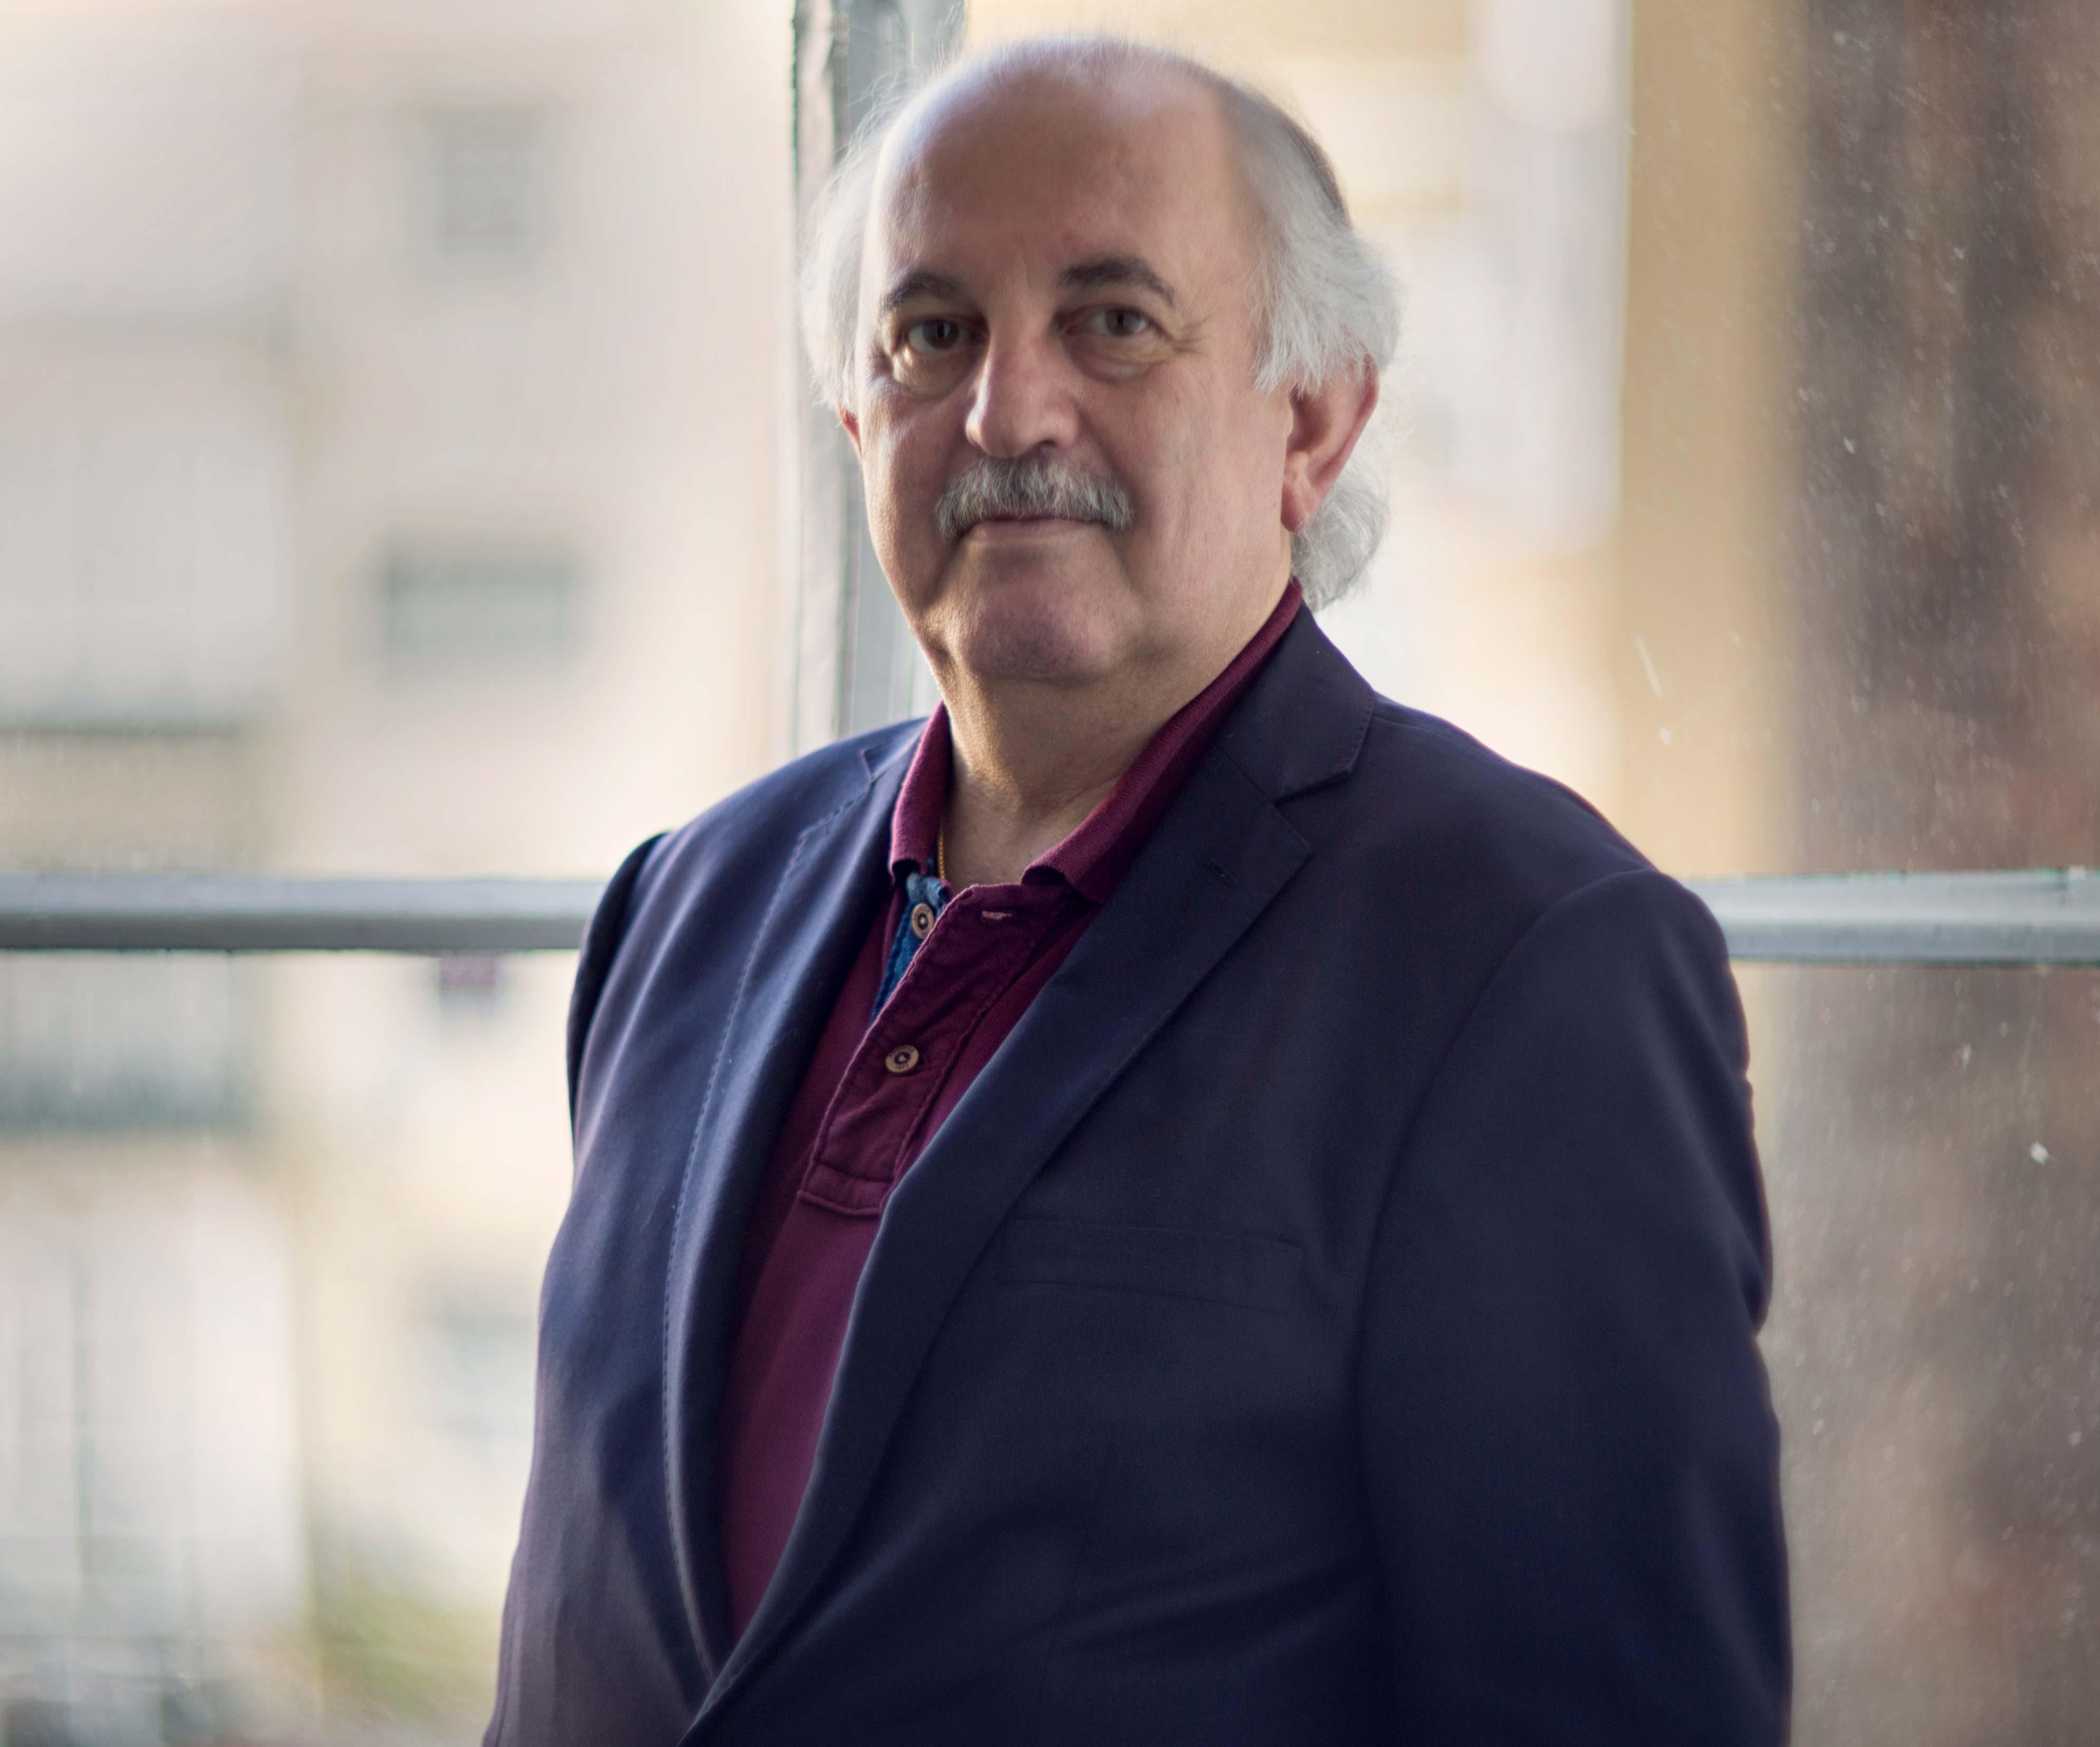 Arif Akbas